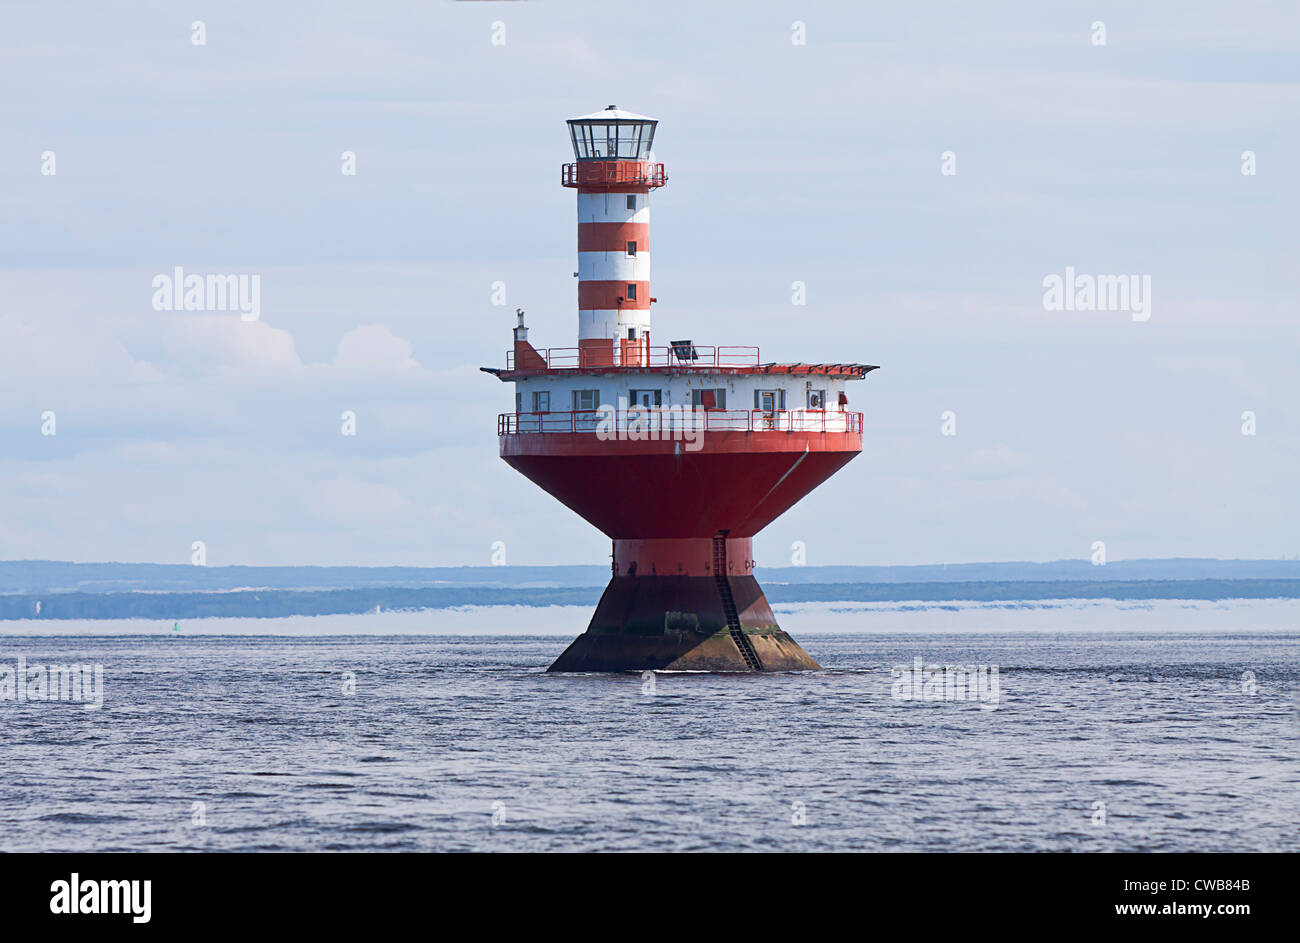 Le phare du haut-fond Prince, haut-fond Prince Light Tadoussac, Québec, Canada Photo Stock